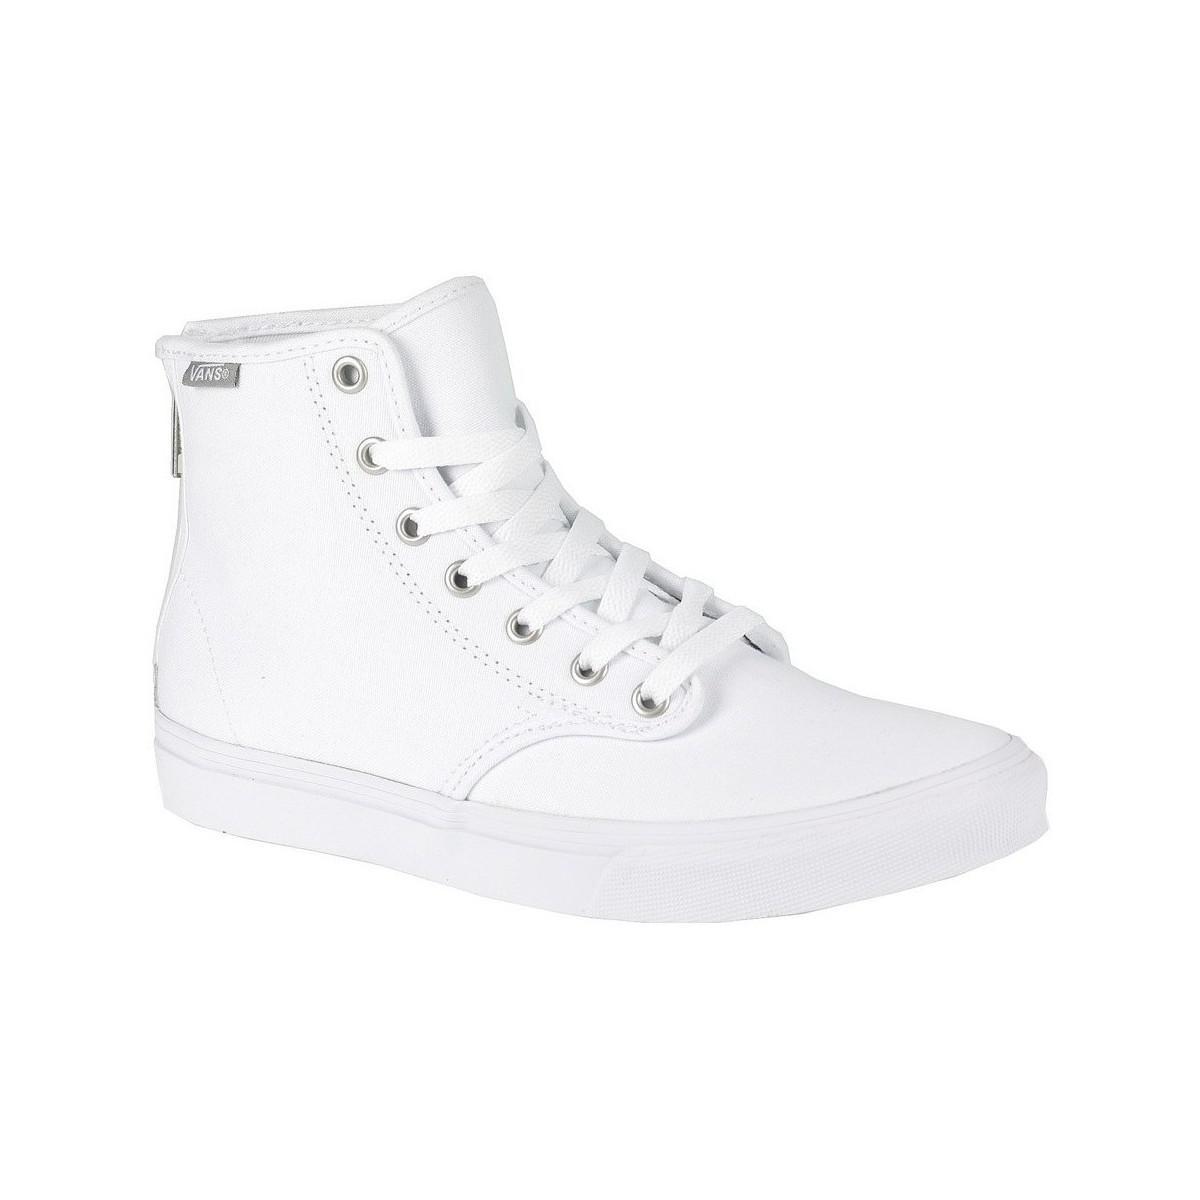 79568296488b52 Vans W Camden Hi Zip Canvas White Women s Shoes (high-top Trainers ...